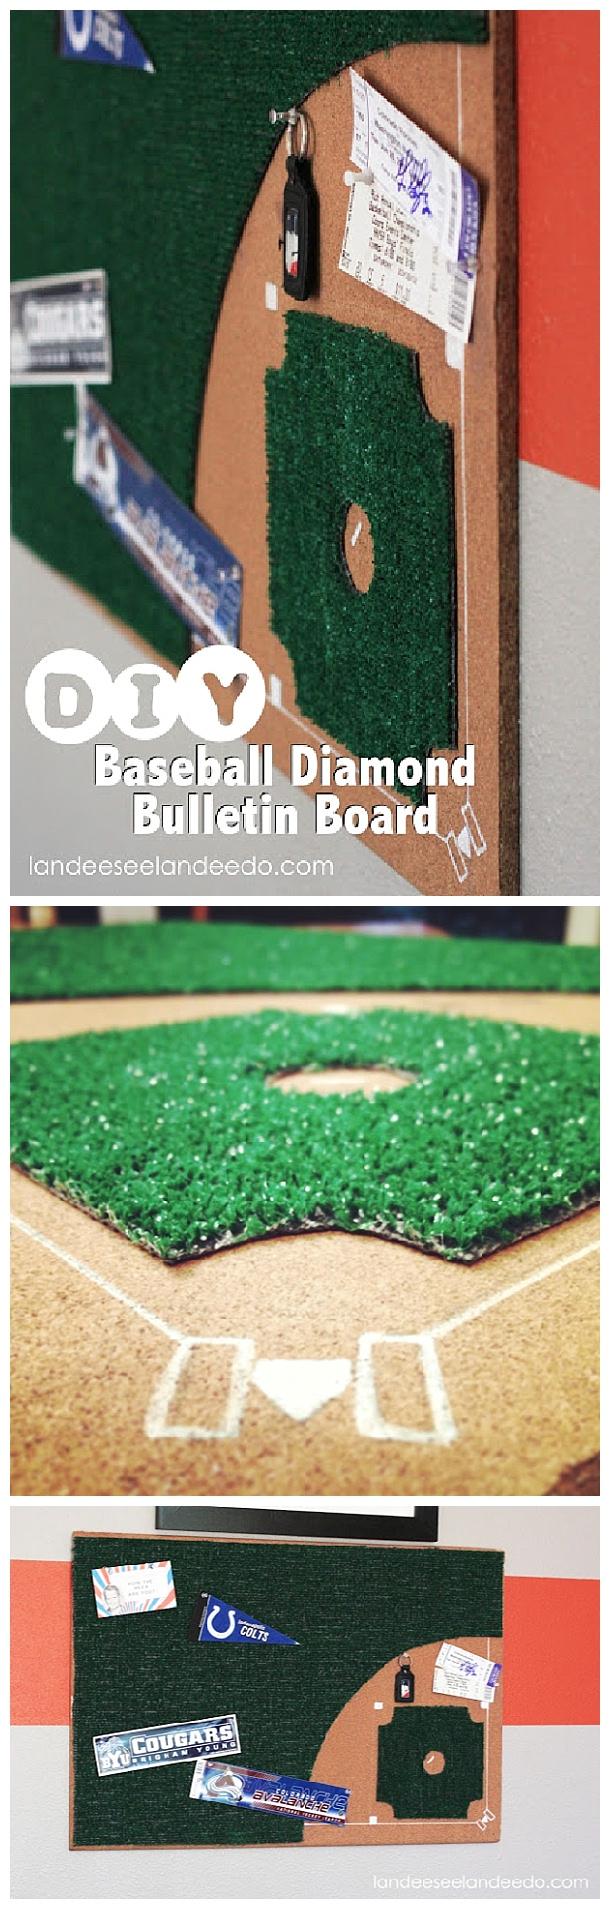 DIY Baseball Diamond Bulletin Board = Easy Do it Yourself Project Tutorial - perfect for Dad's den, man cave or the office! Tutorial via Landeelu